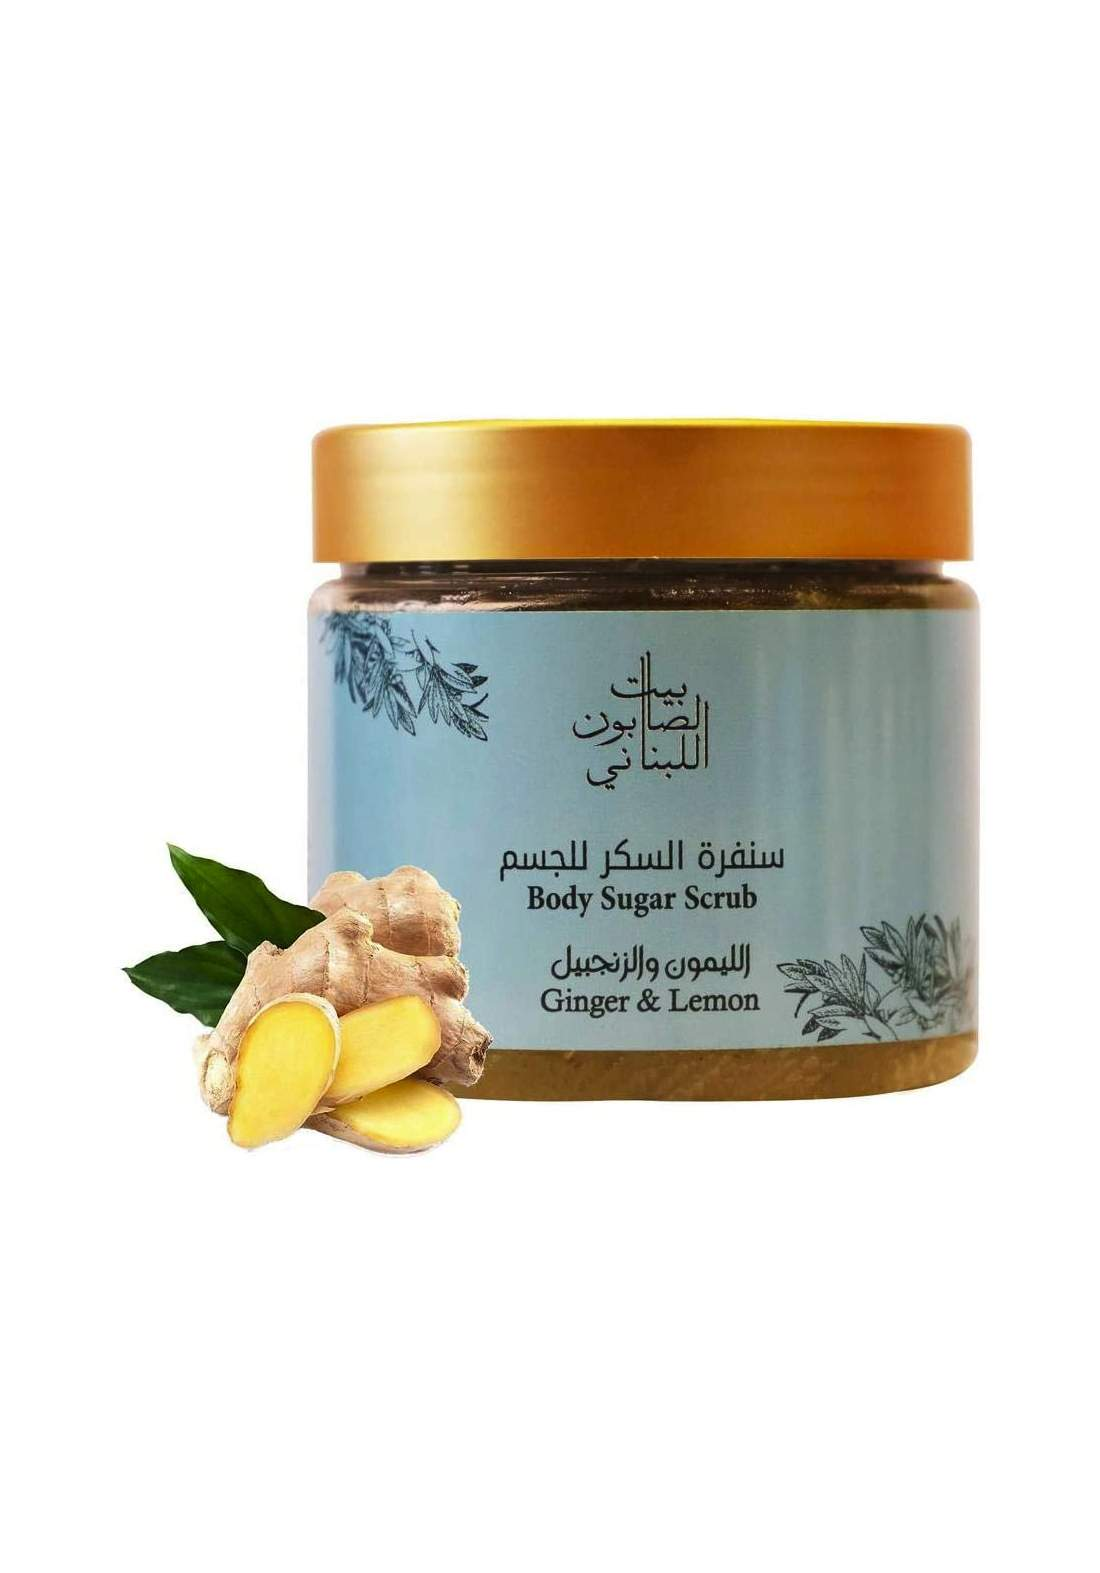 Bayt Alsaboun Alloubnani-317446 Body Sugar Scrub Ginger&Lemon 500g سنفرة